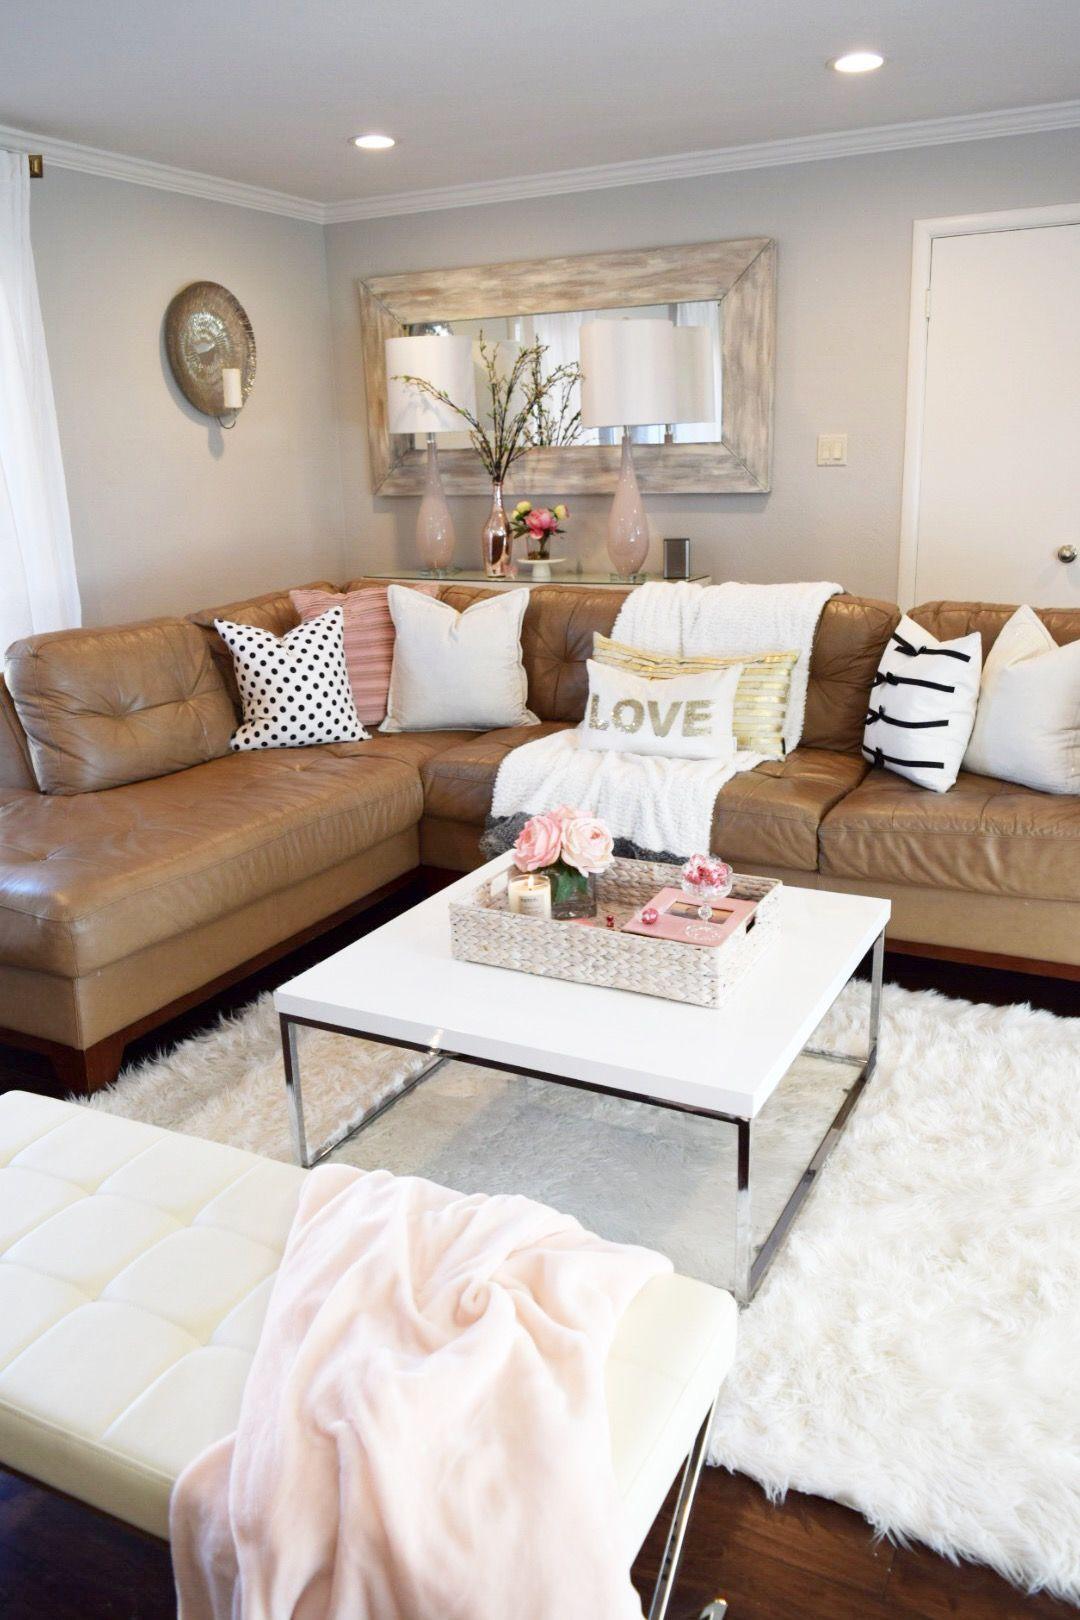 Tan Couch Living Room Tan Couch Living Room Brown Couch Living Room Couch Decor